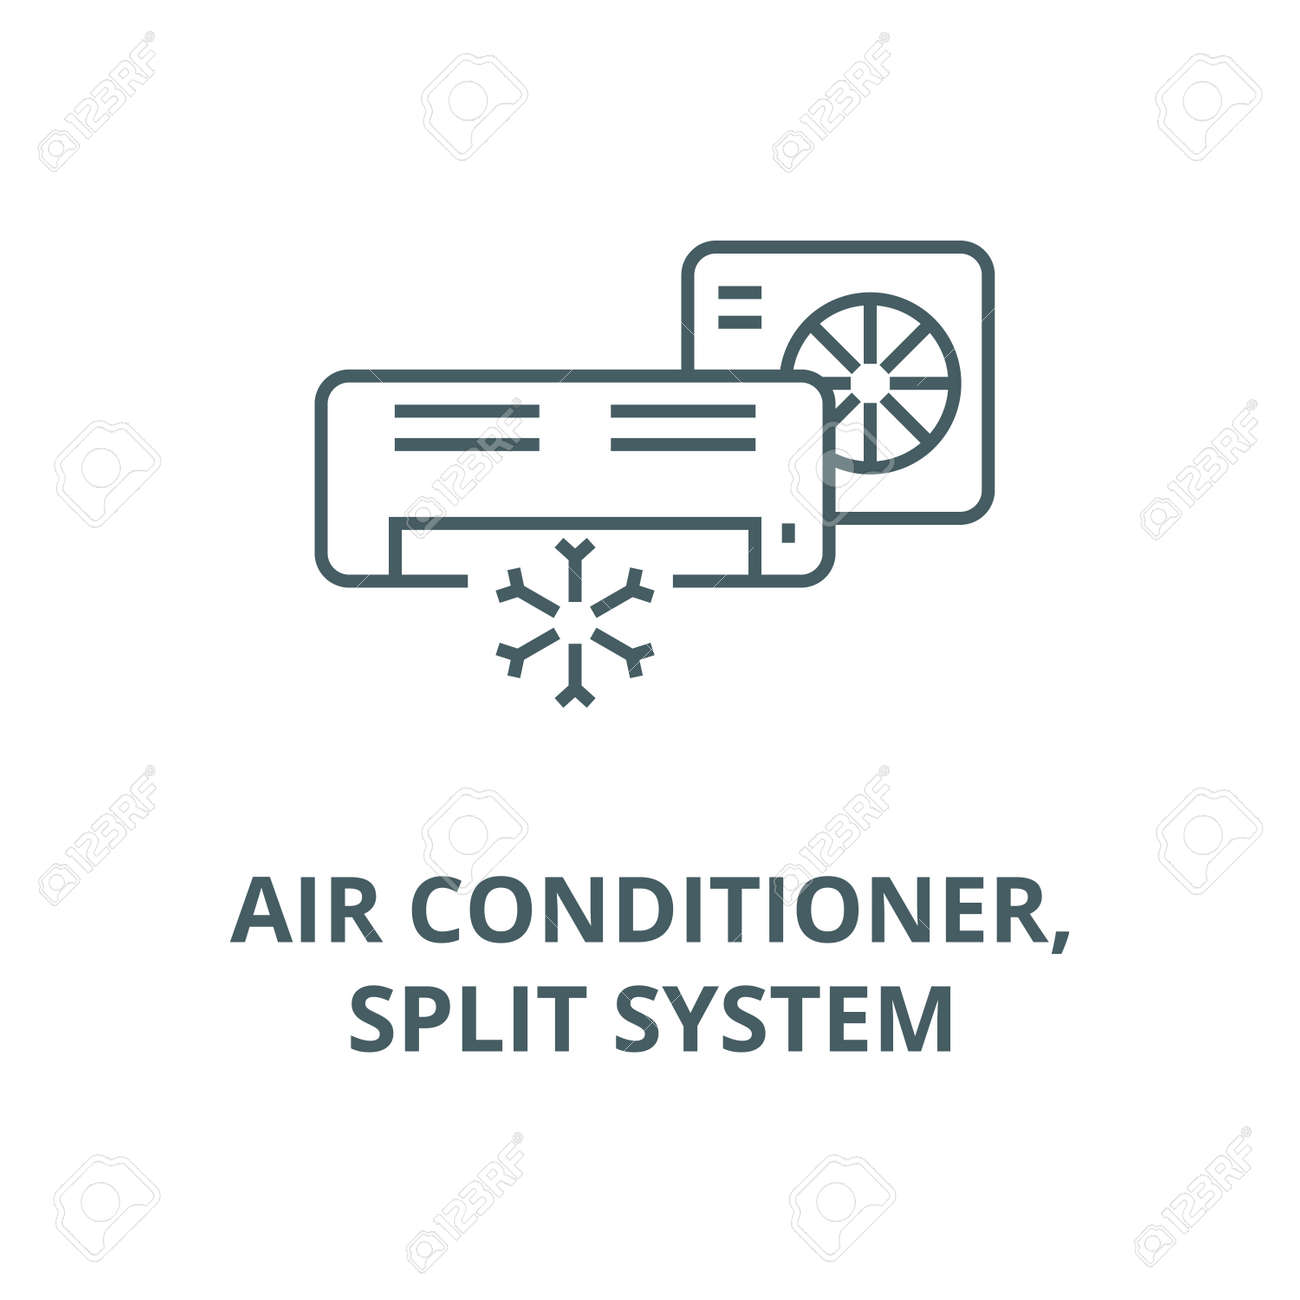 Air conditioner,split system line icon, vector. Air conditioner,split system outline sign, concept symbol, illustration - 123789821